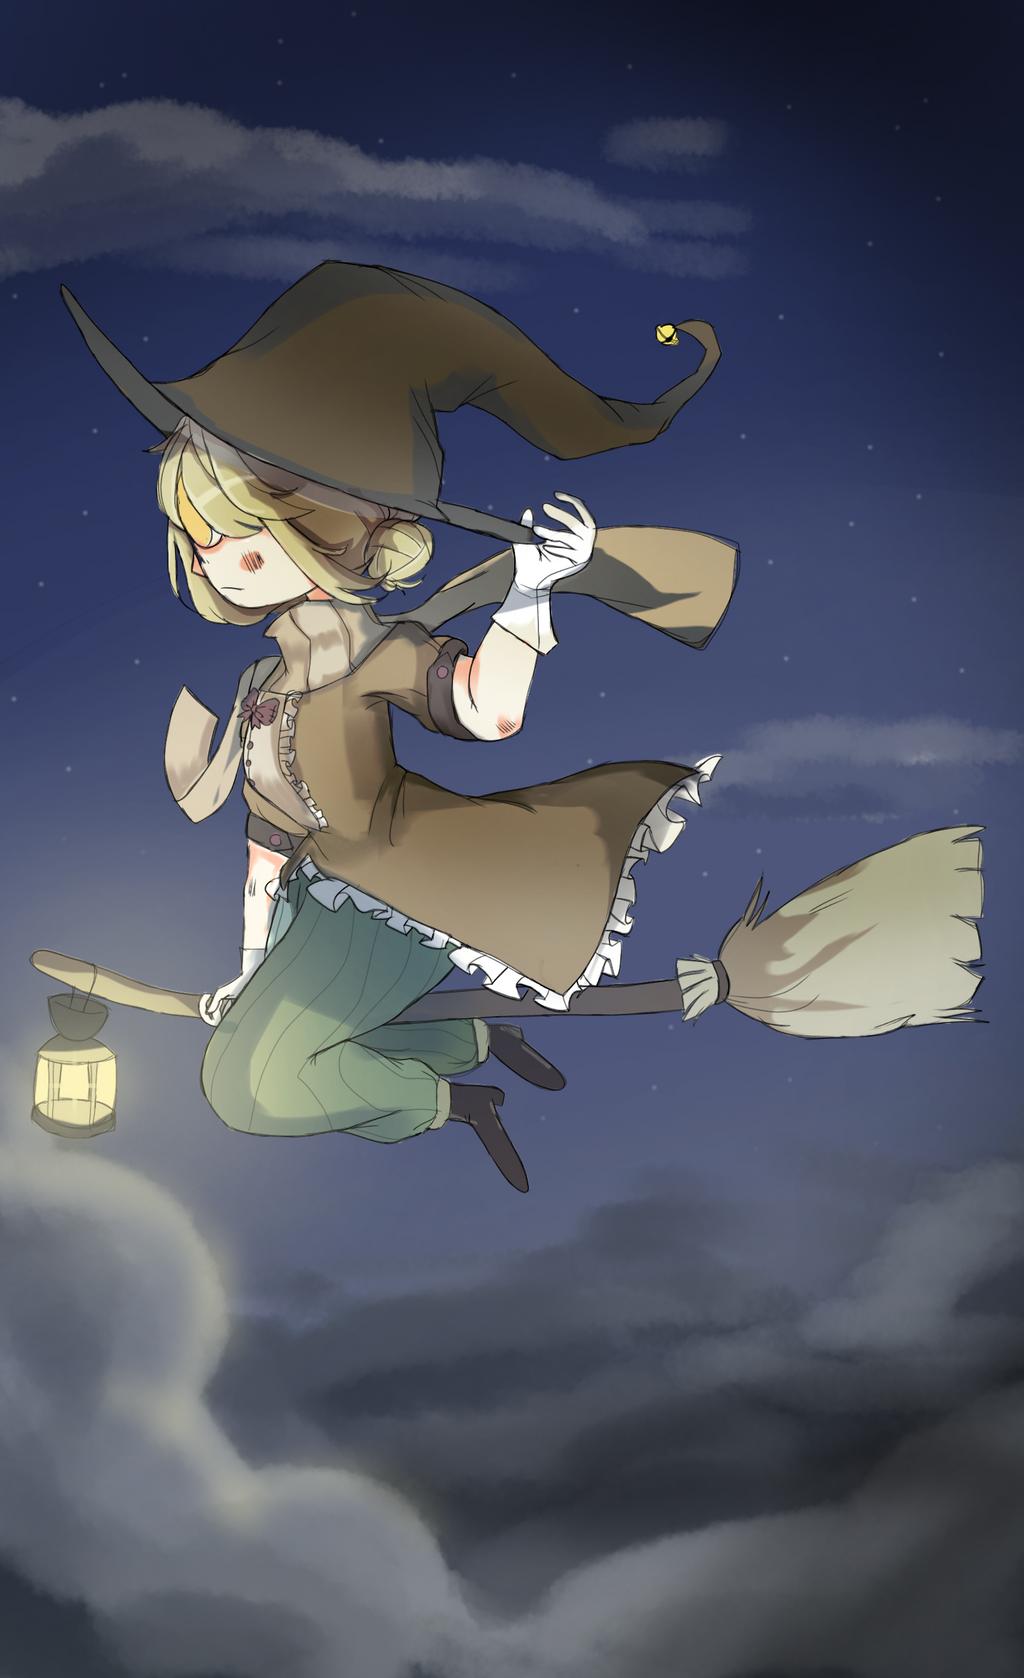 Flying through the night by justarandomfruit